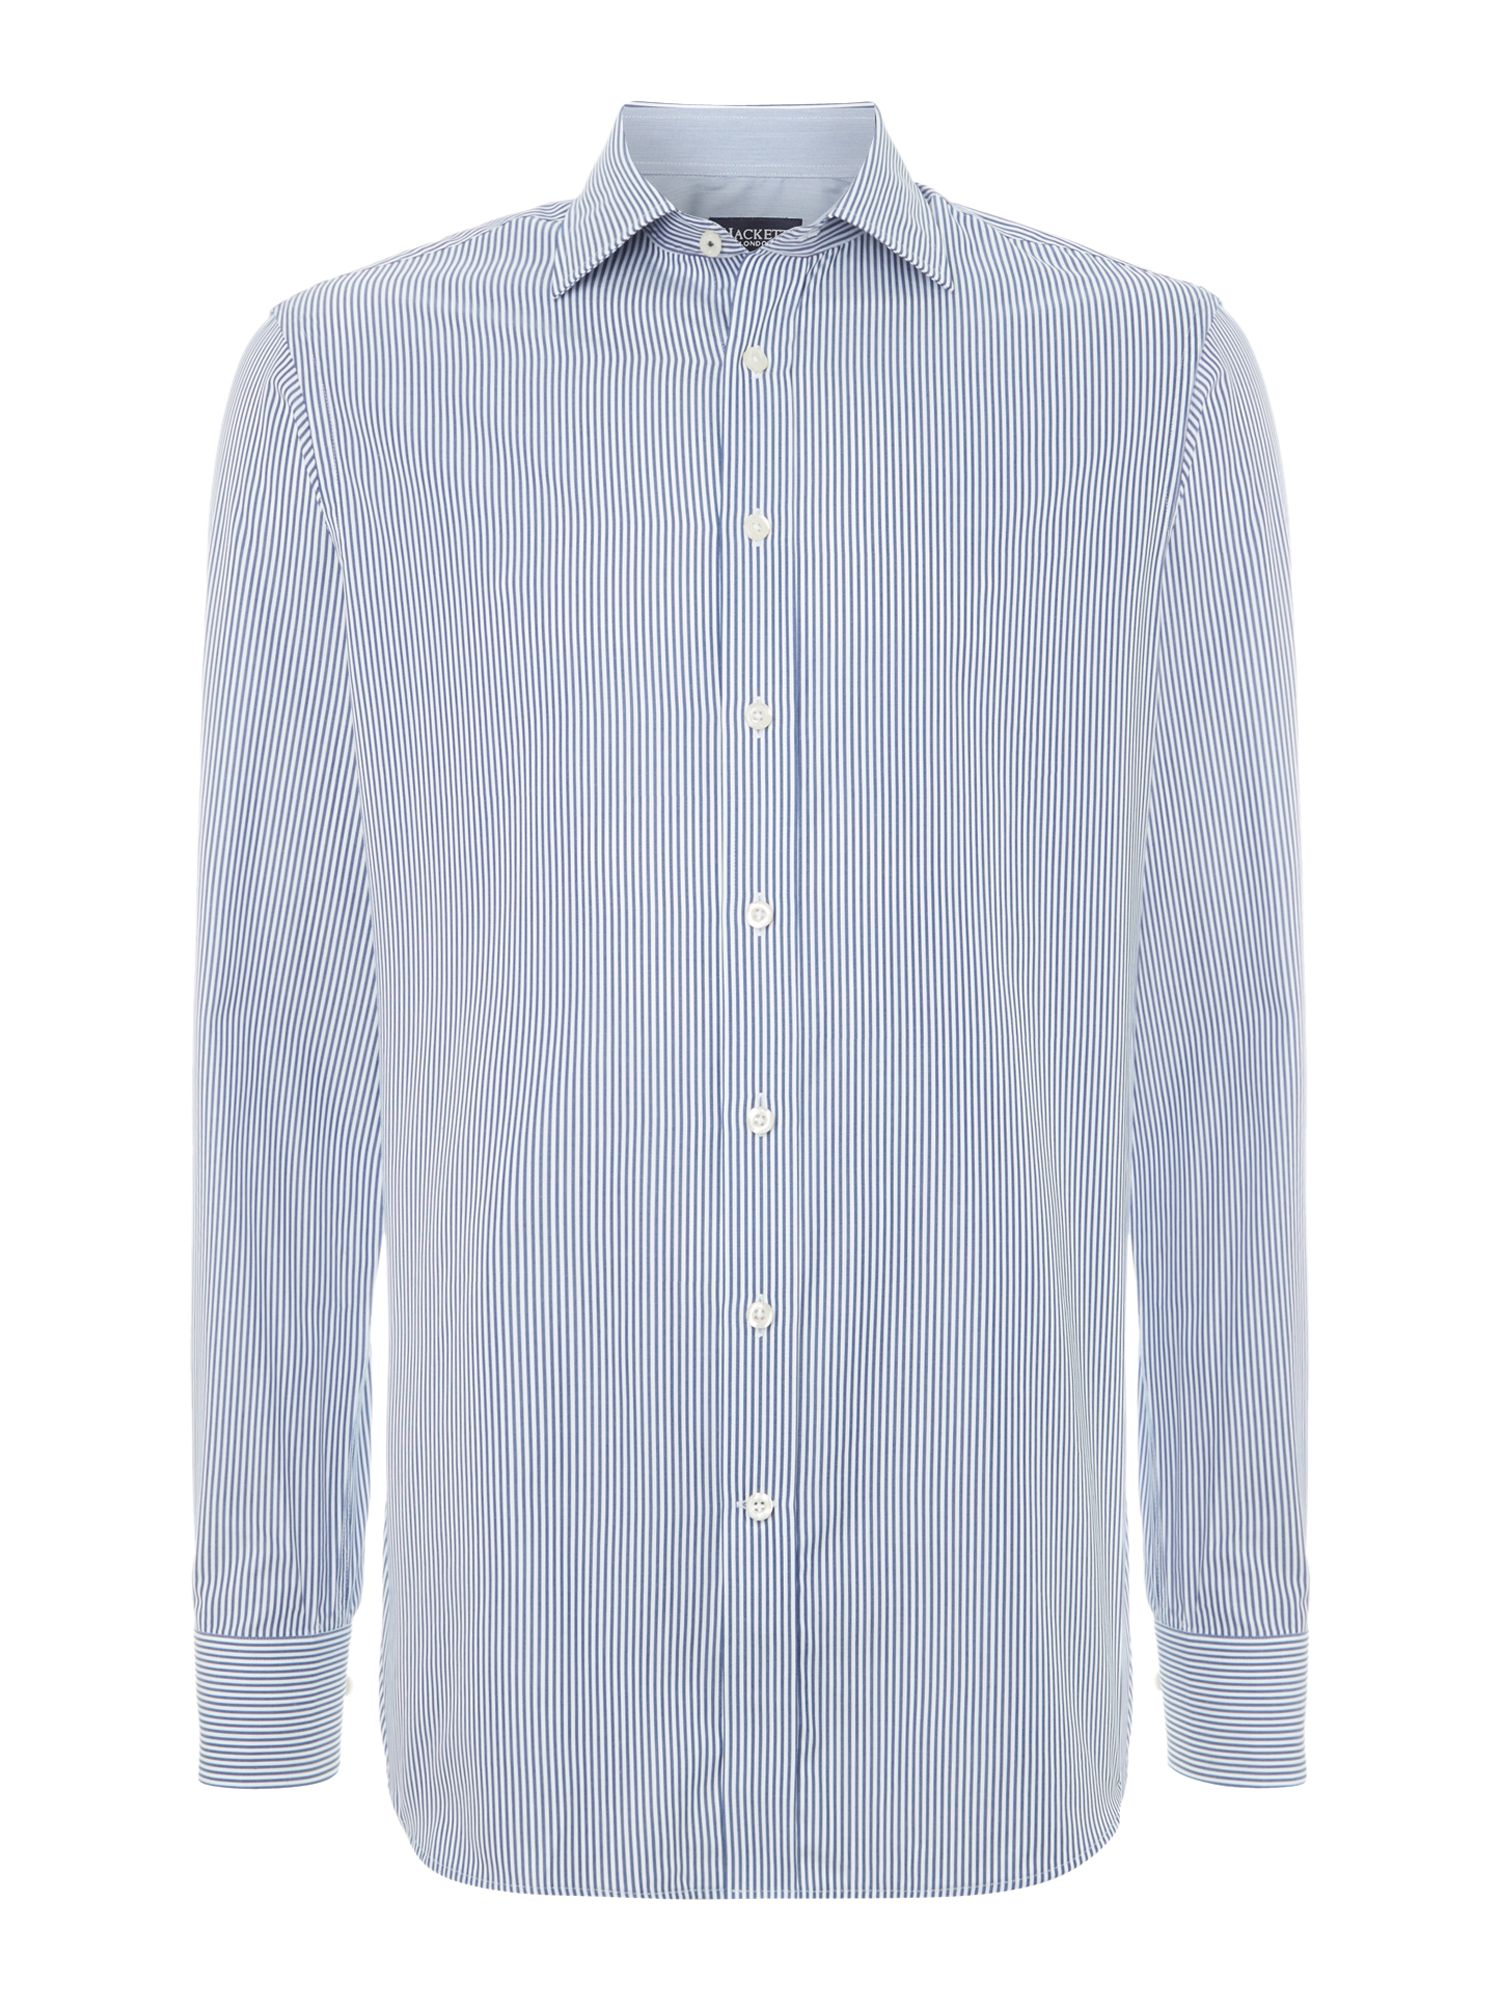 Hackett long sleeve stripe shirt in blue for men navy for Navy blue striped long sleeve shirt